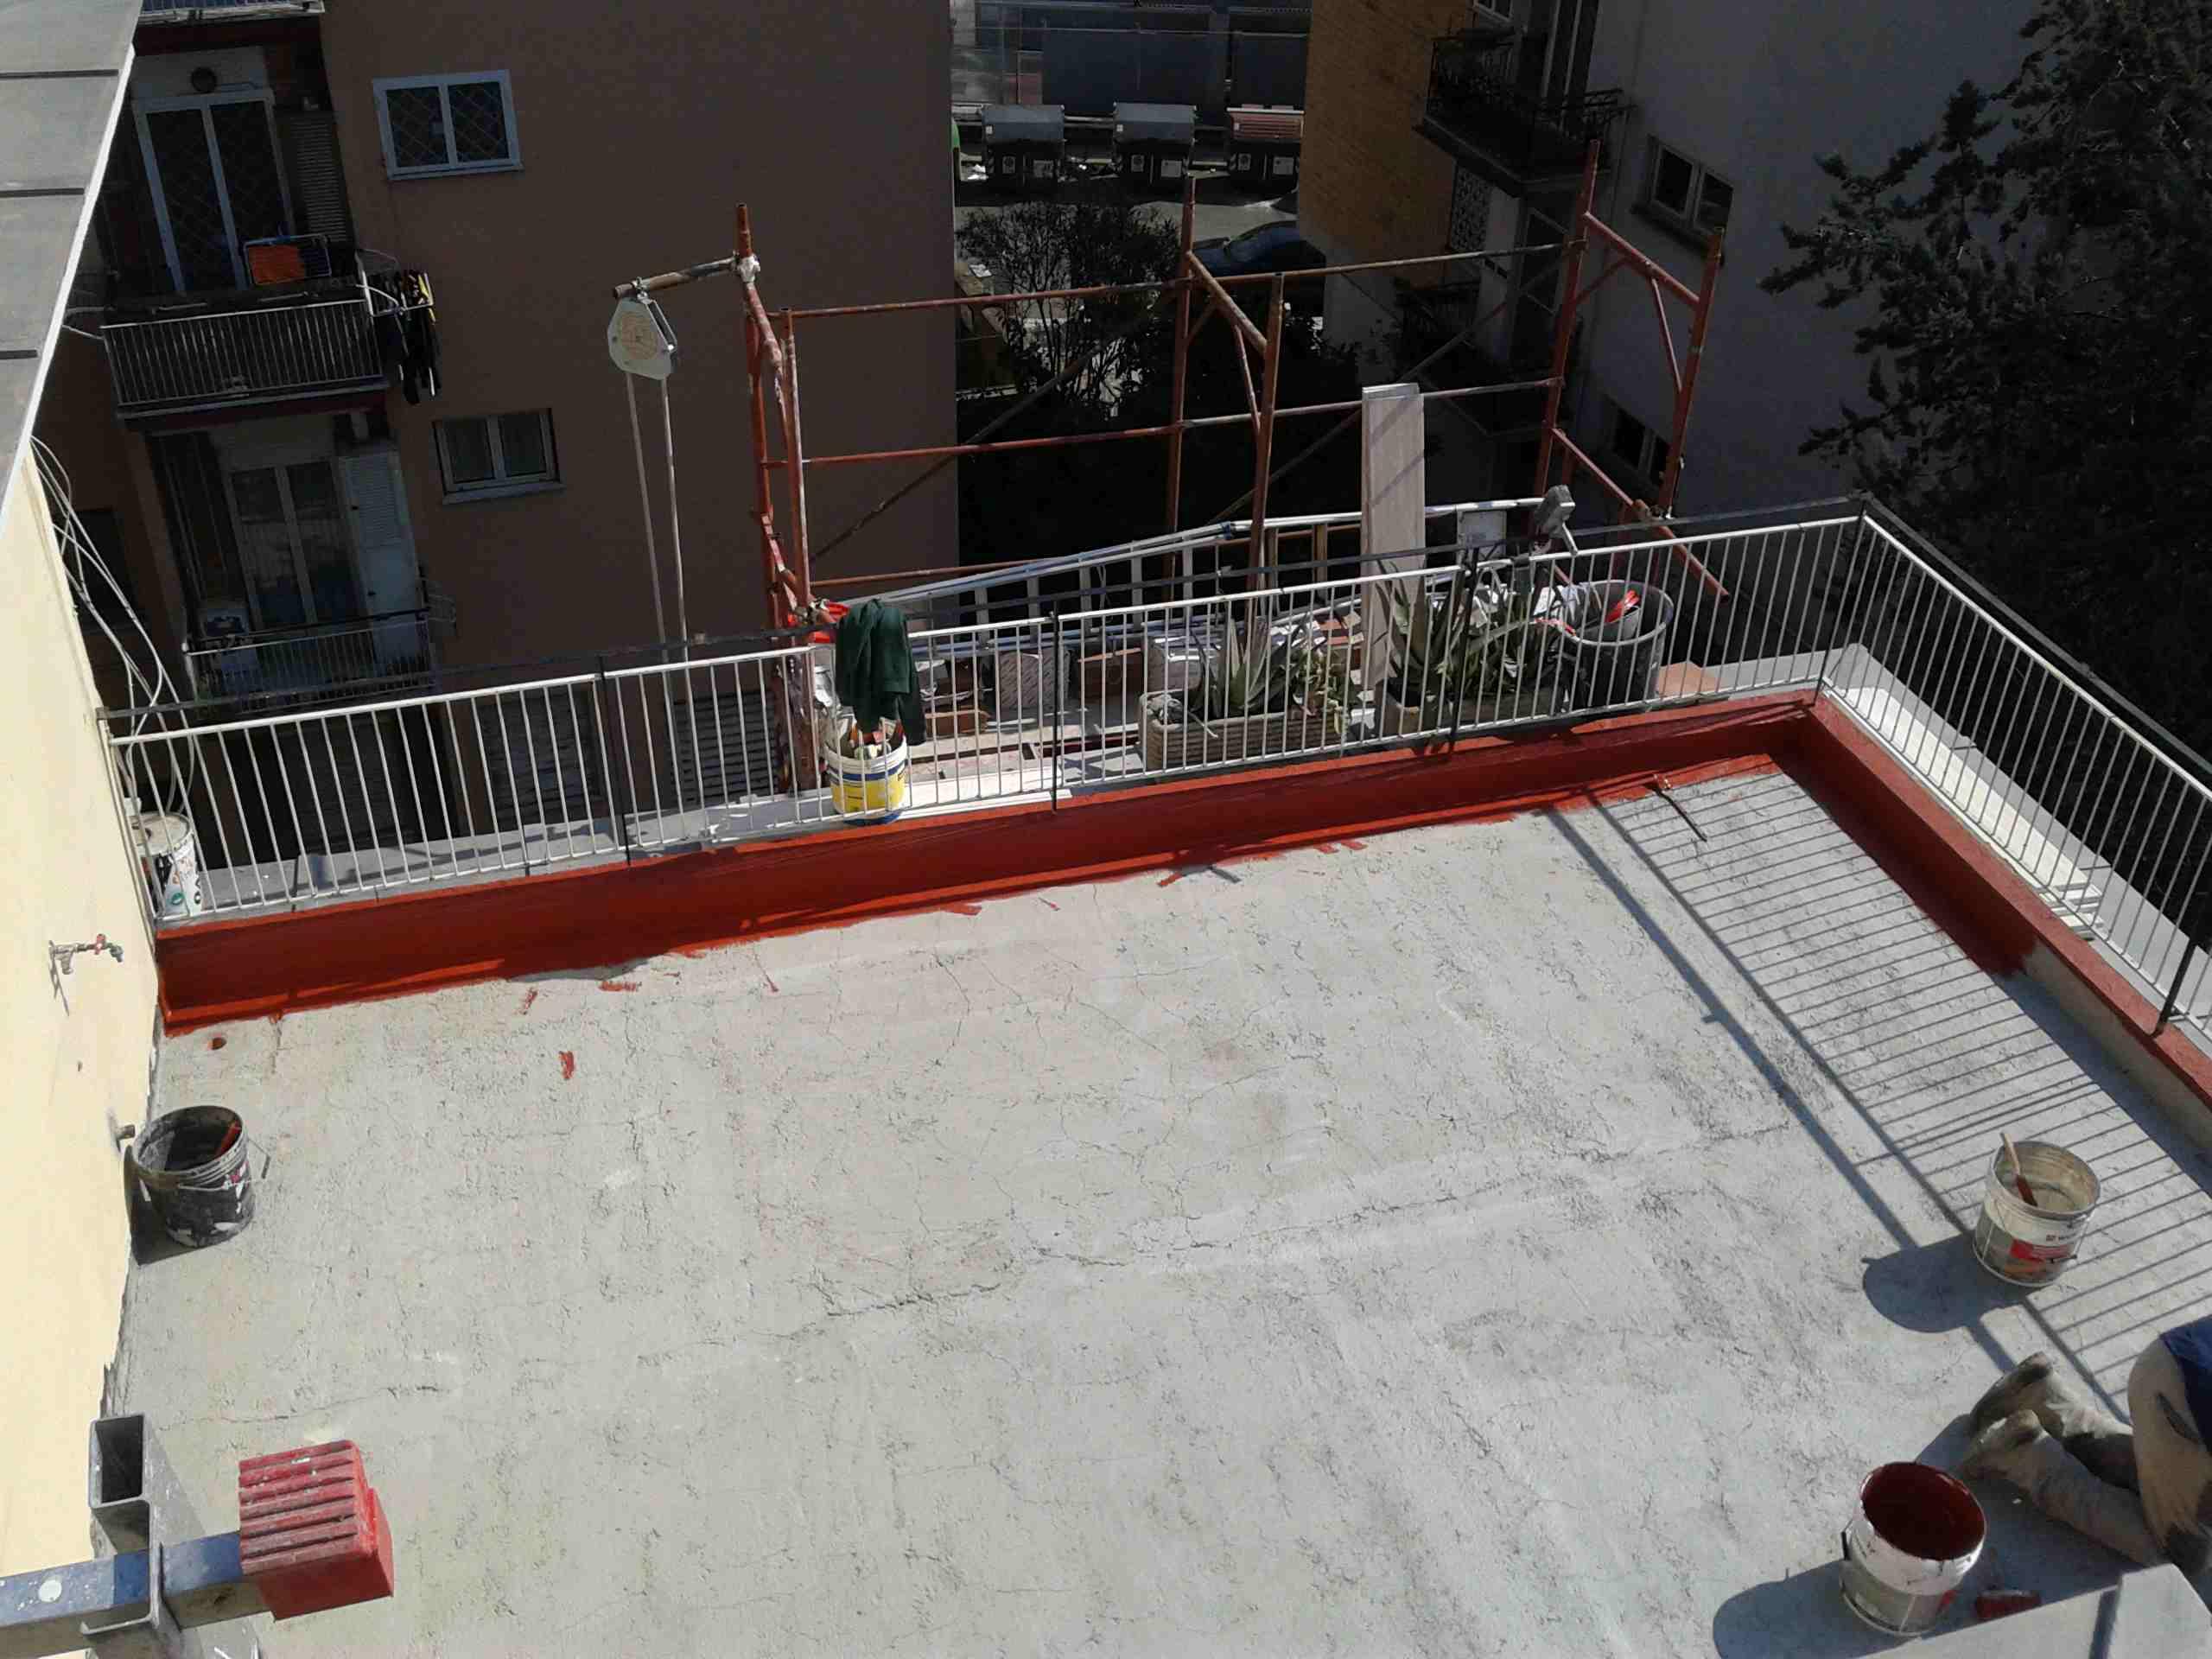 Best Rifacimento Terrazzo Condominiale Images - Home Design ...